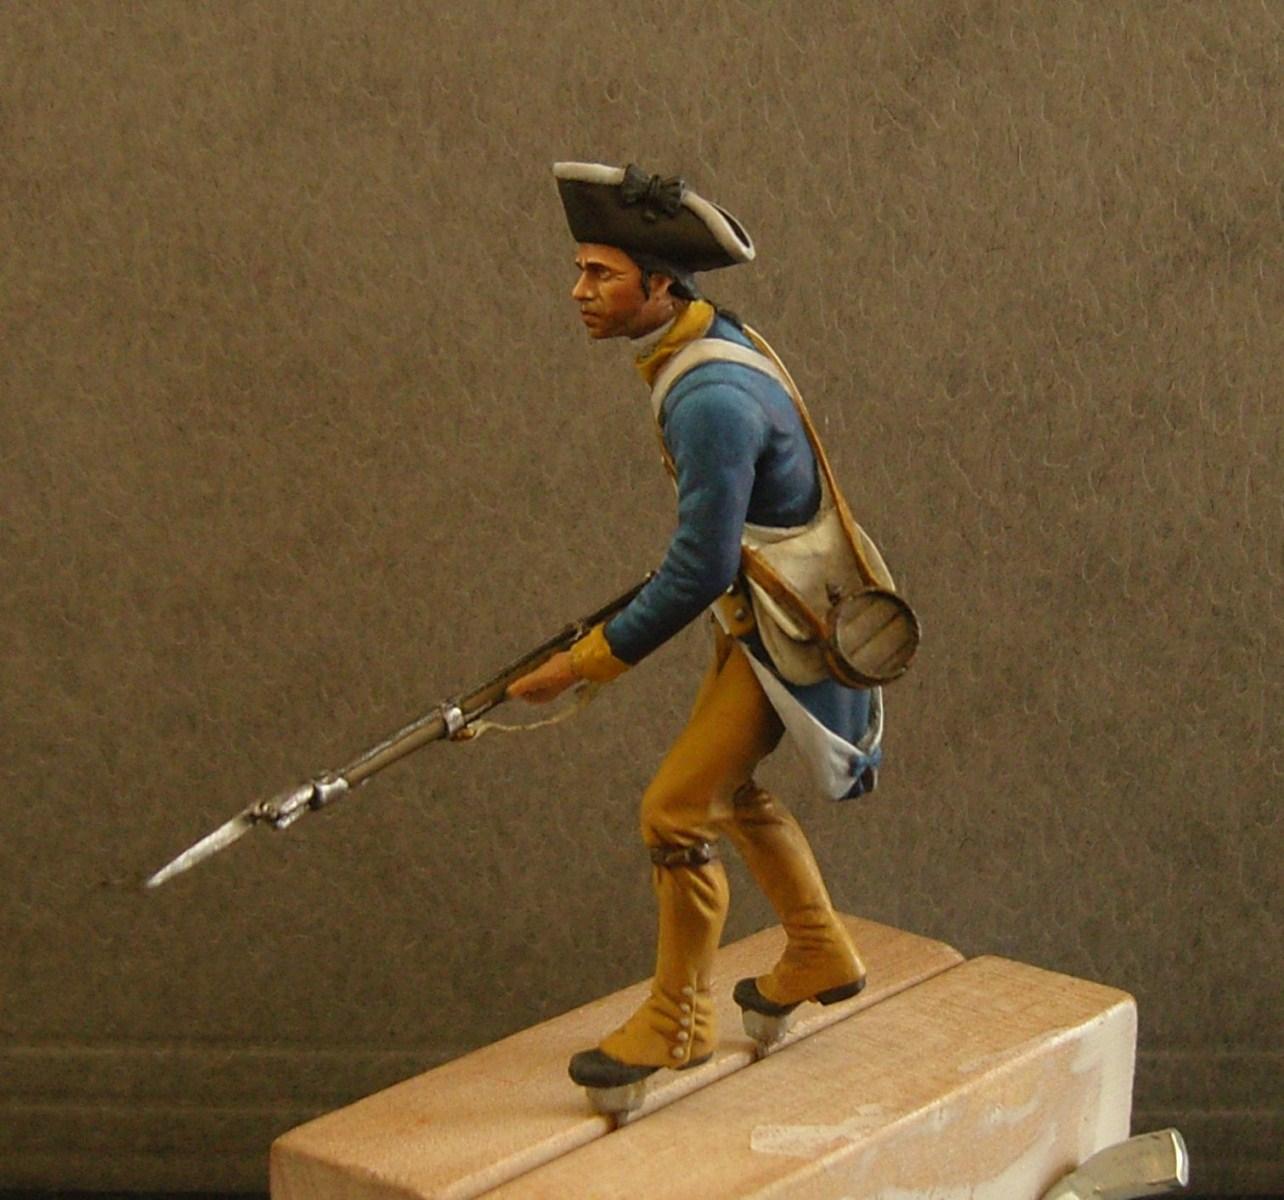 US Revolutionary Infantryman, 1780 - Page 7 120226033338699799494552